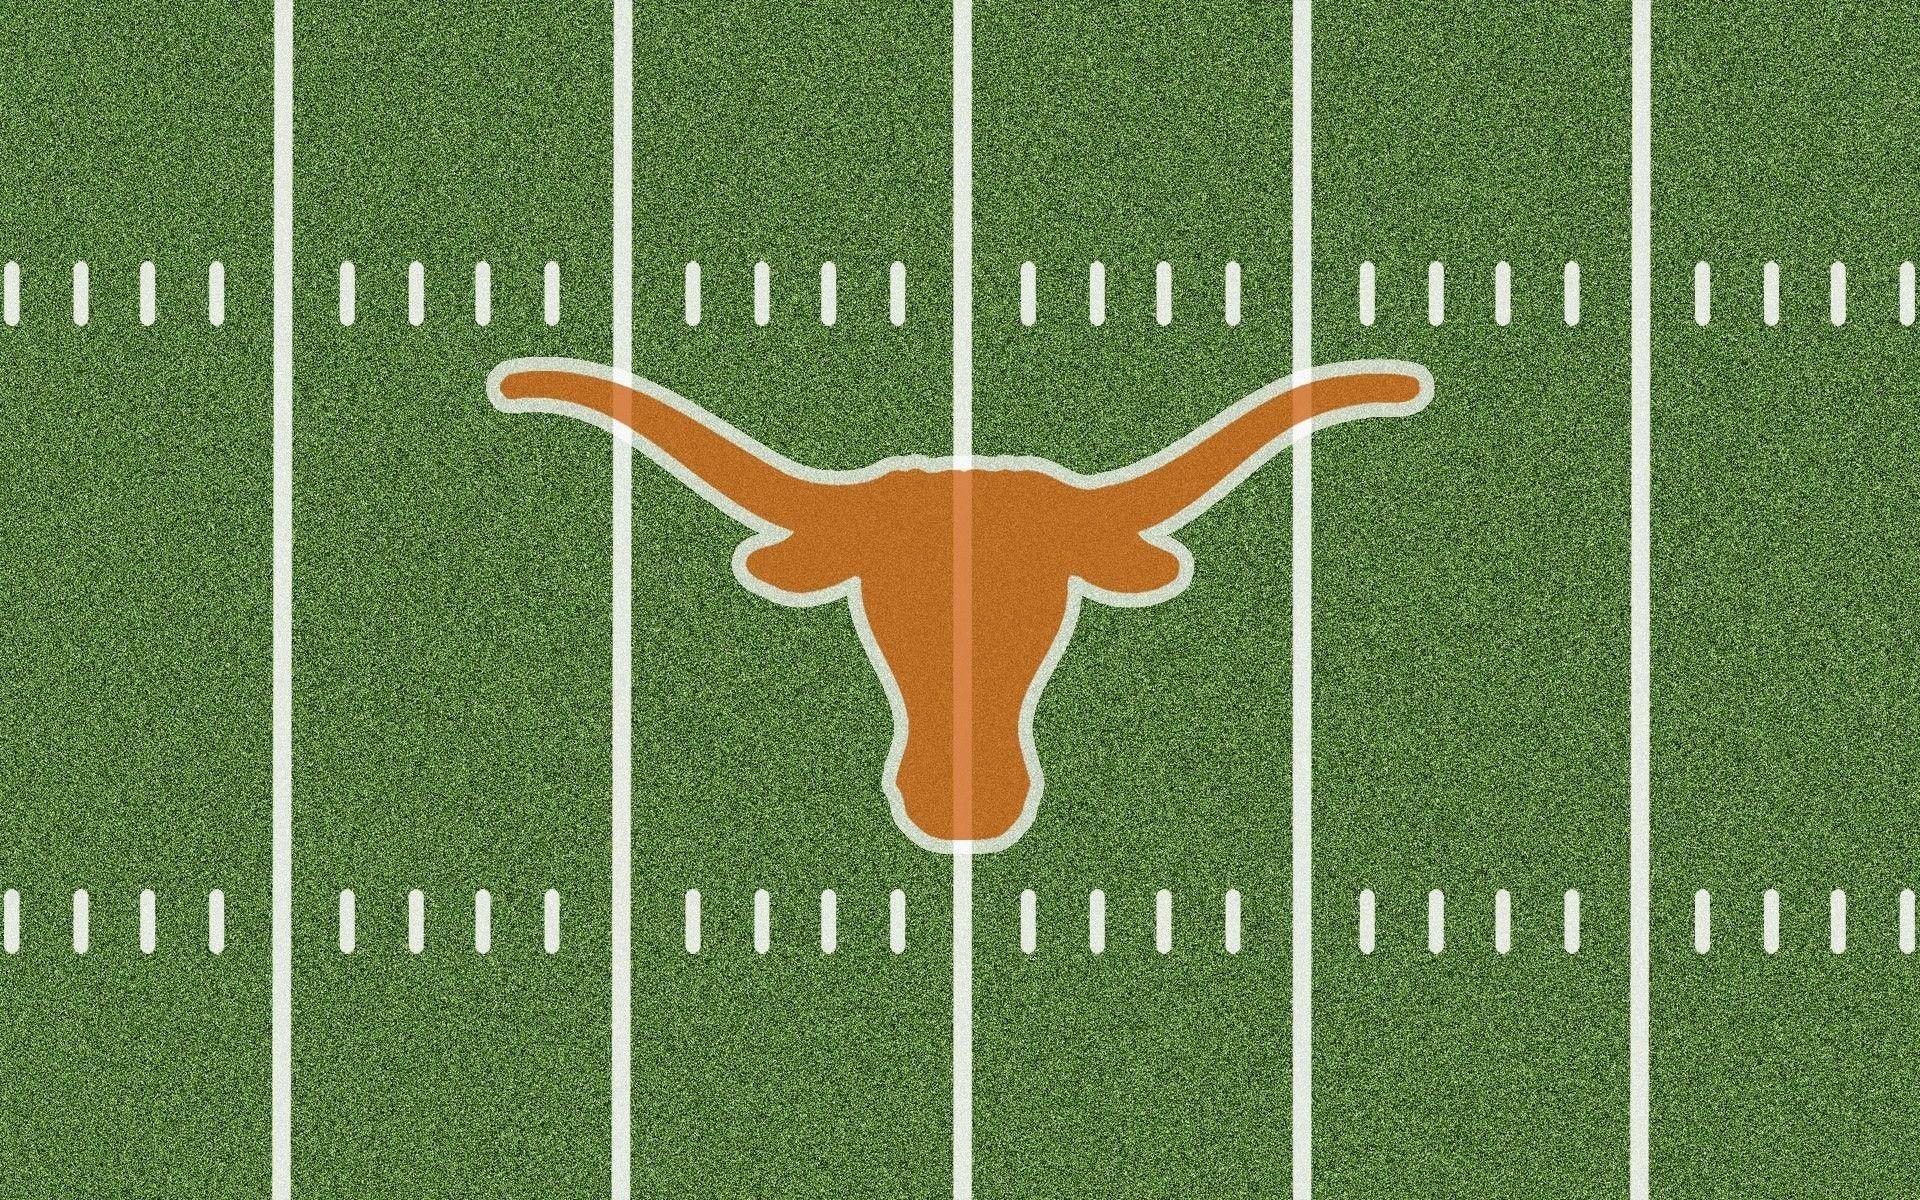 1920x1200 Texas Longhorns Football Desktop Background Longhorns